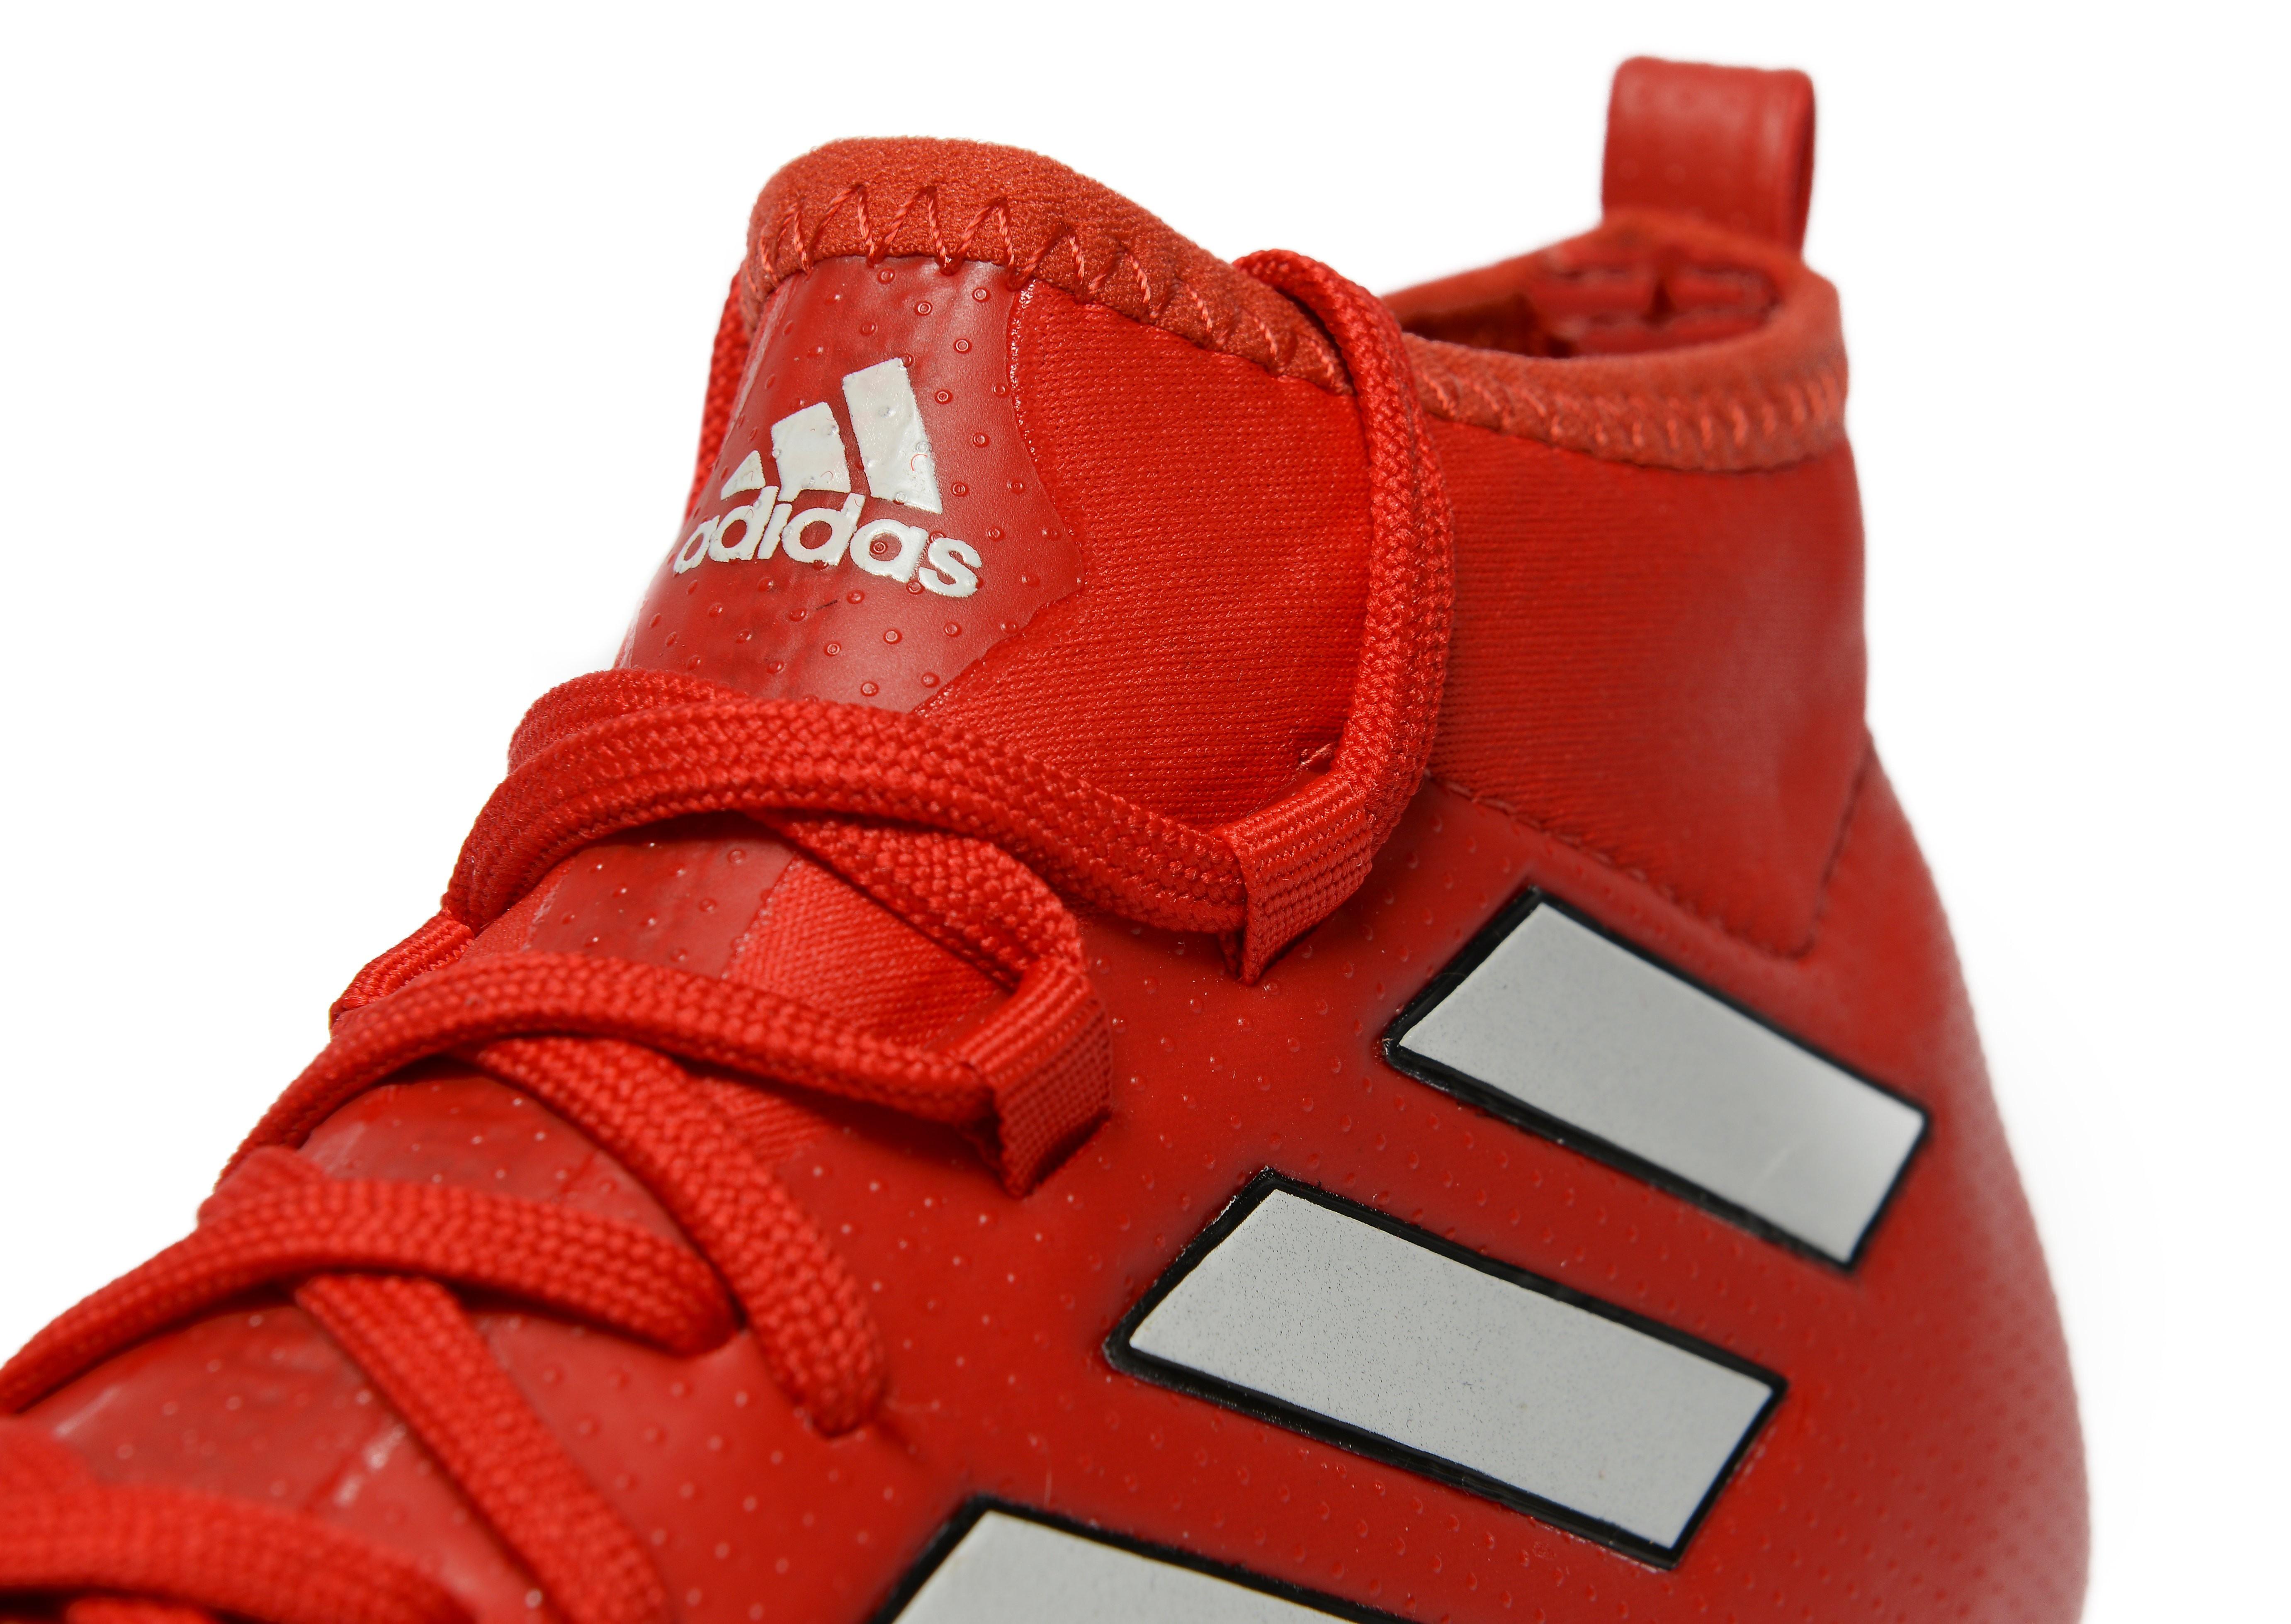 adidas Red Limit ACE 17.1 Primeknit FG Children